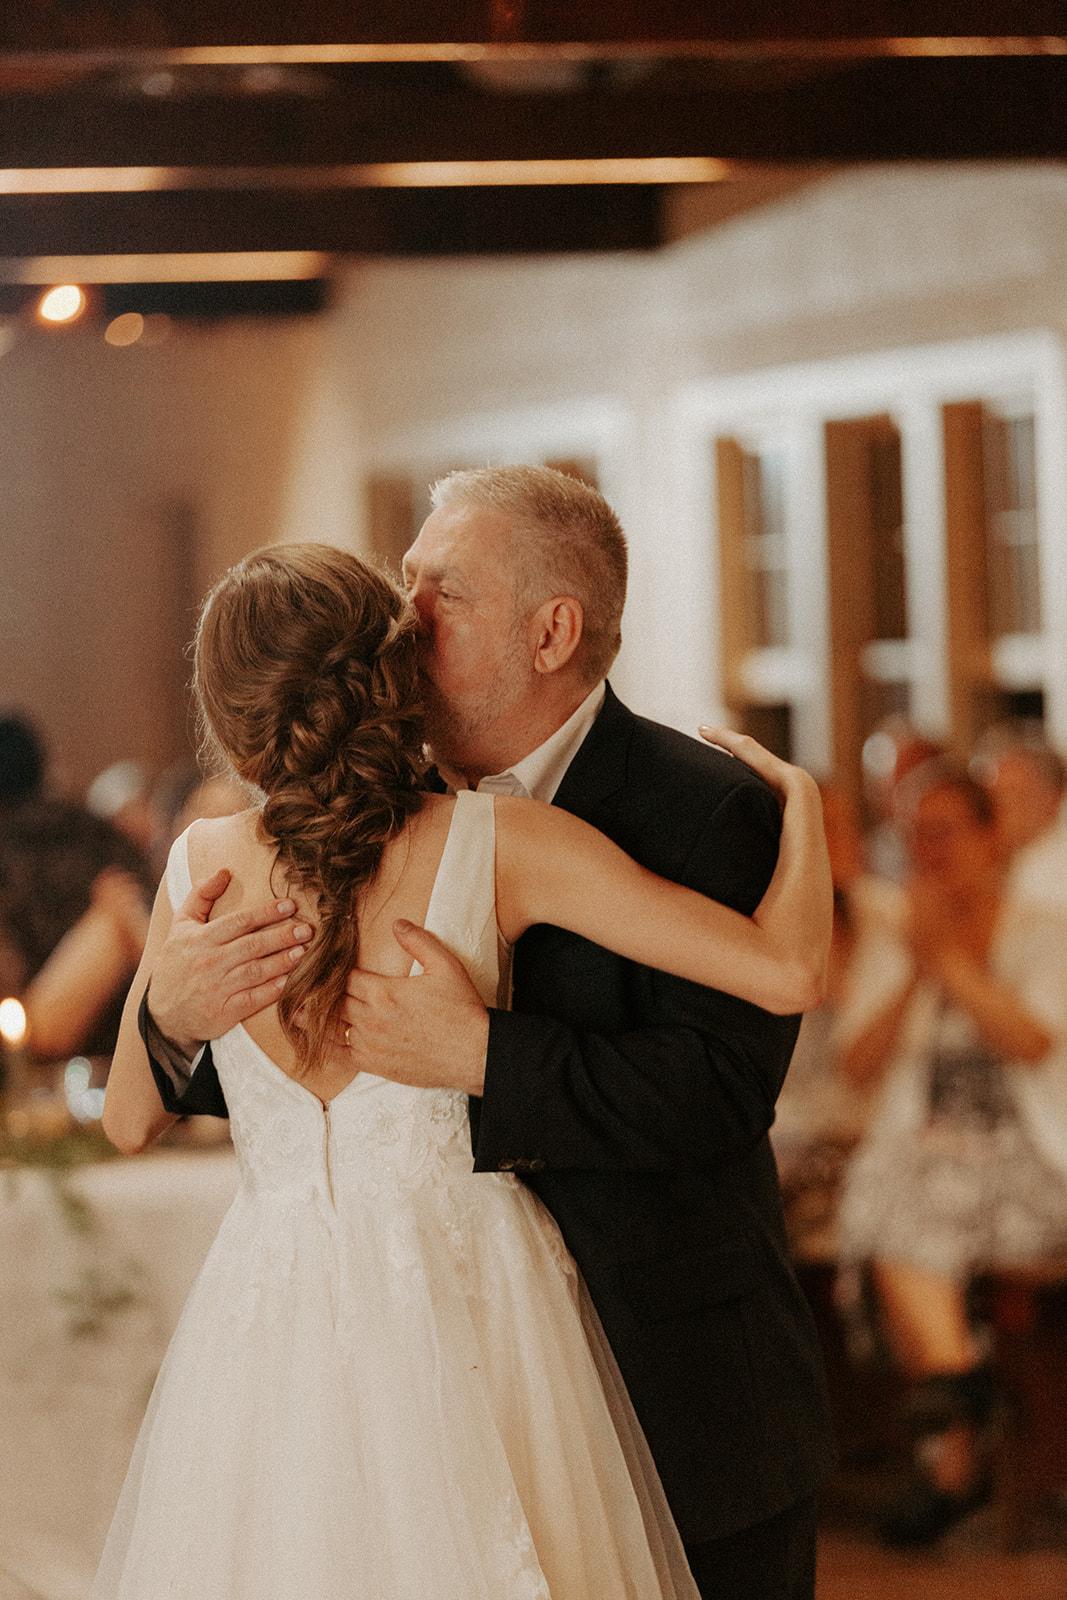 camp_wokanda_peoria_illinois_wedding_photographer_wright_photographs_bliese_0979.jpg